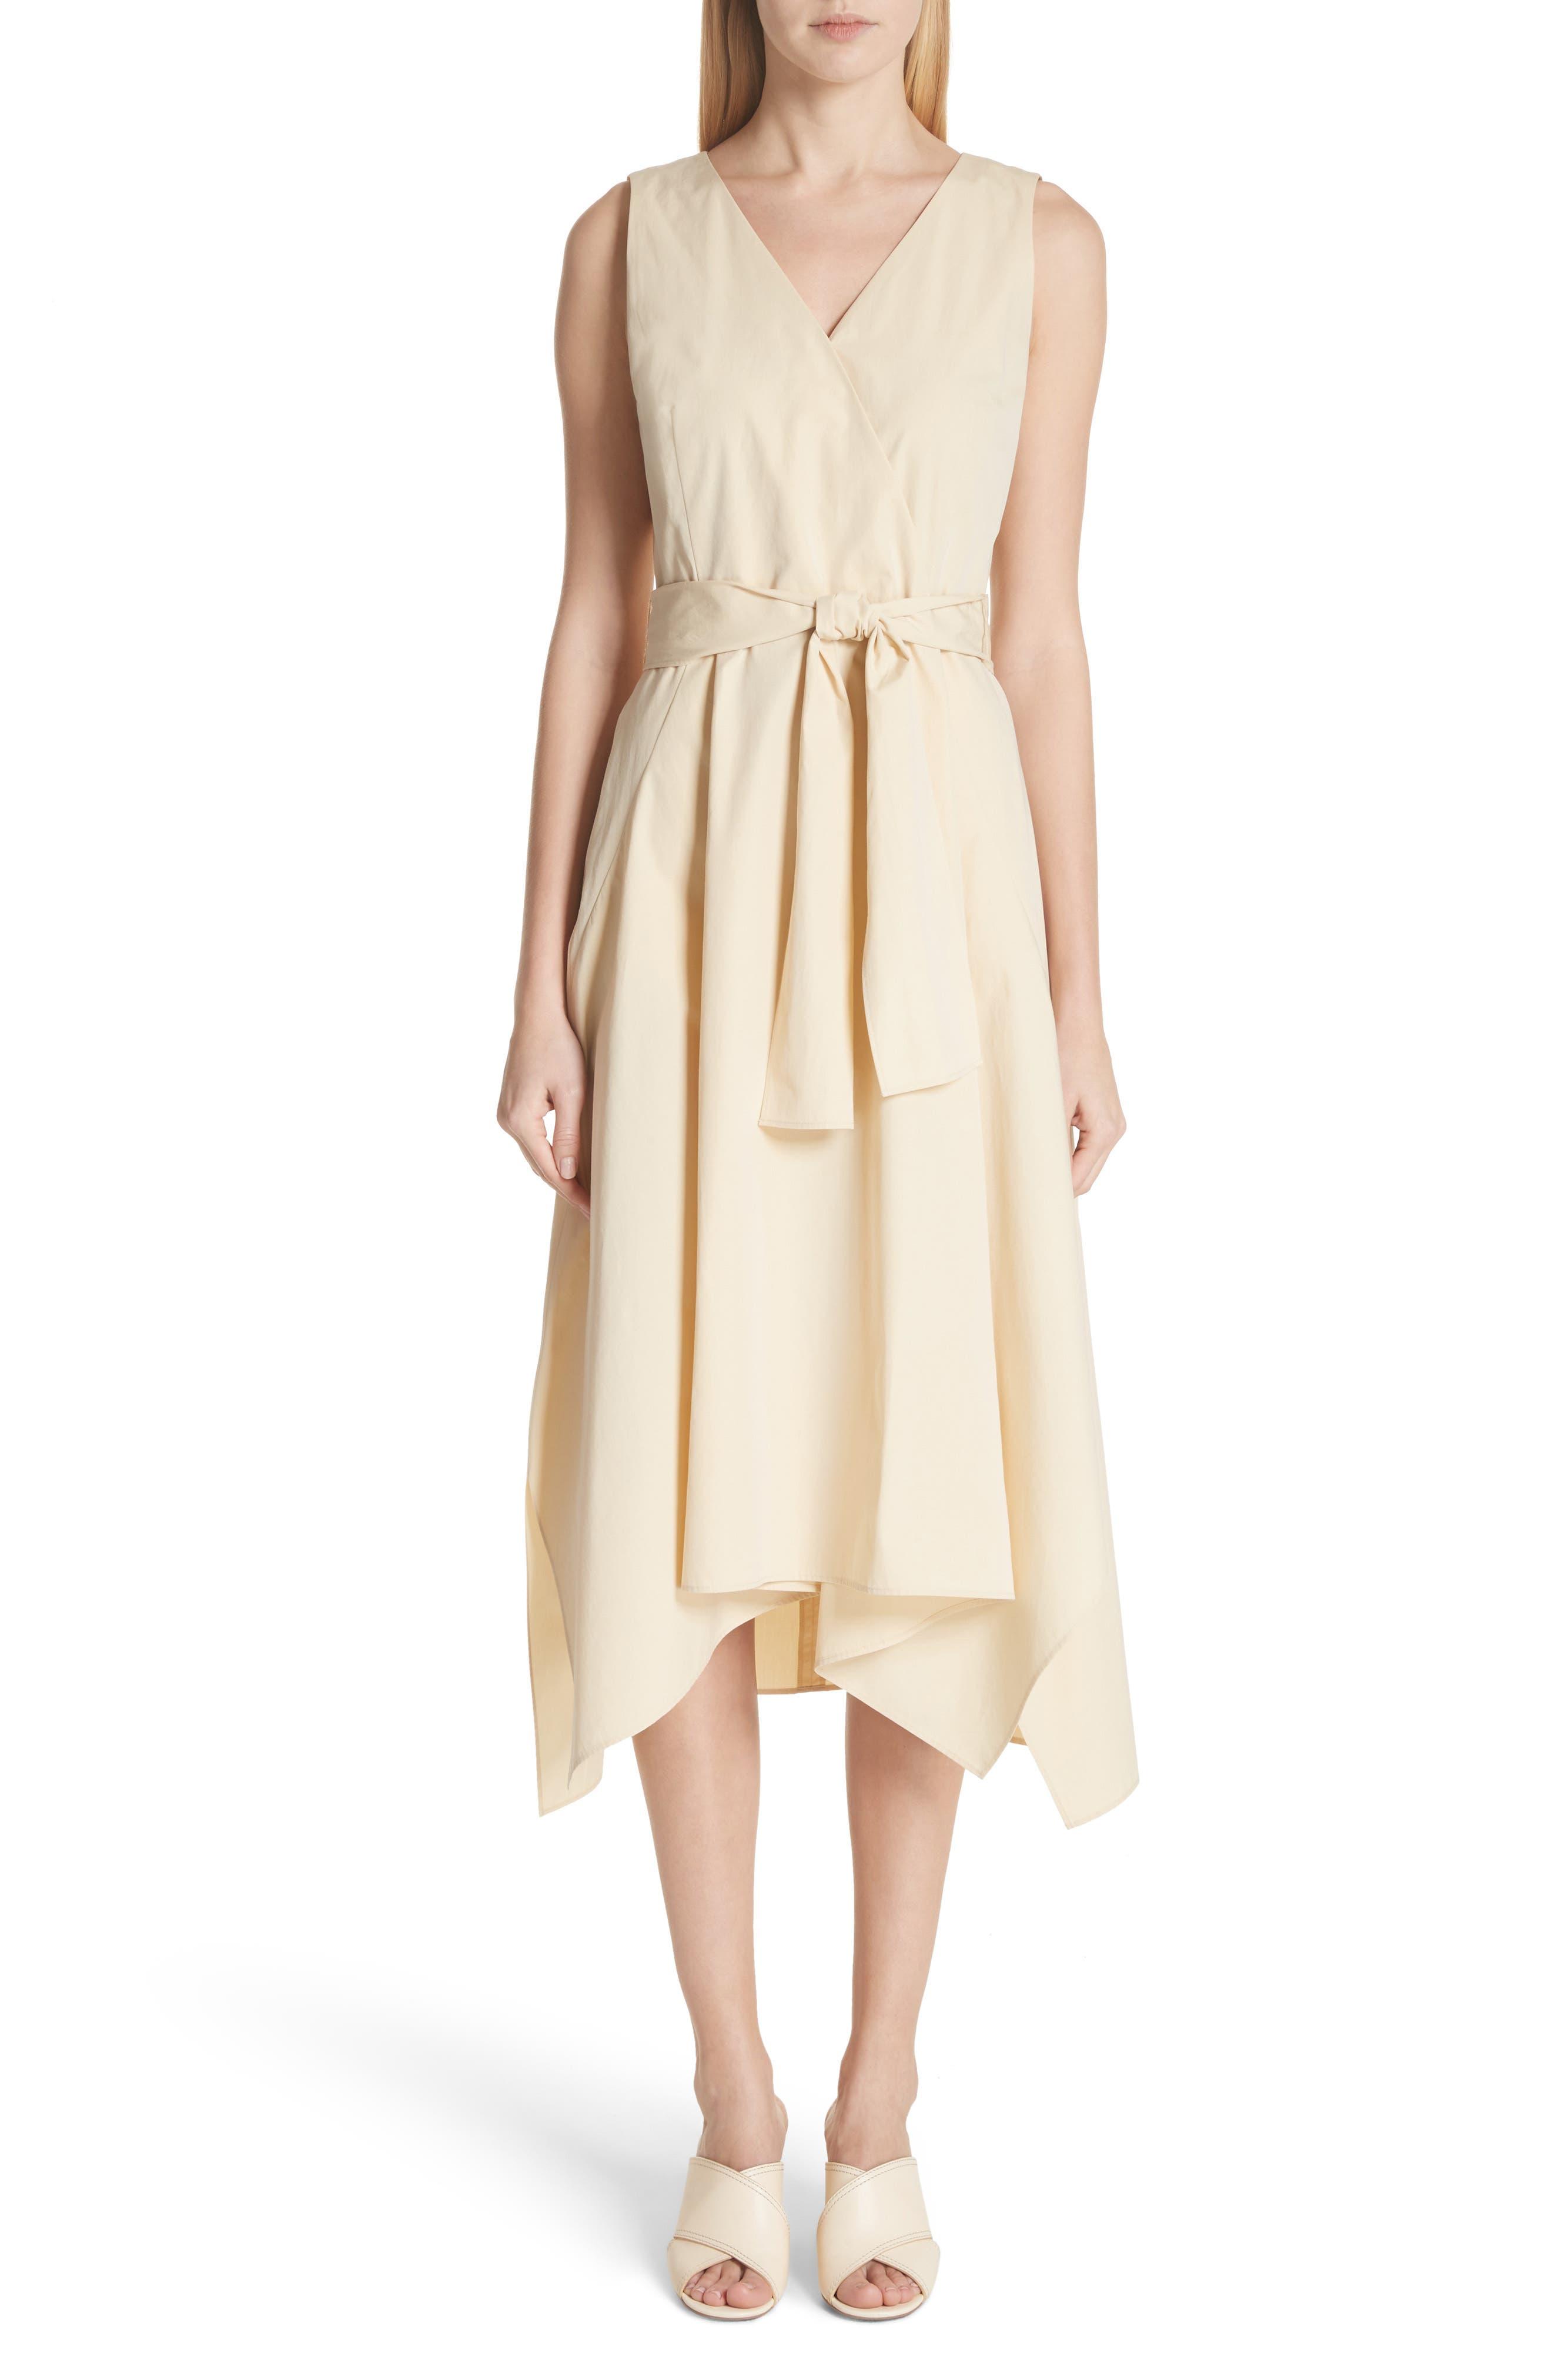 DEMETRIA POPLIN DRESS